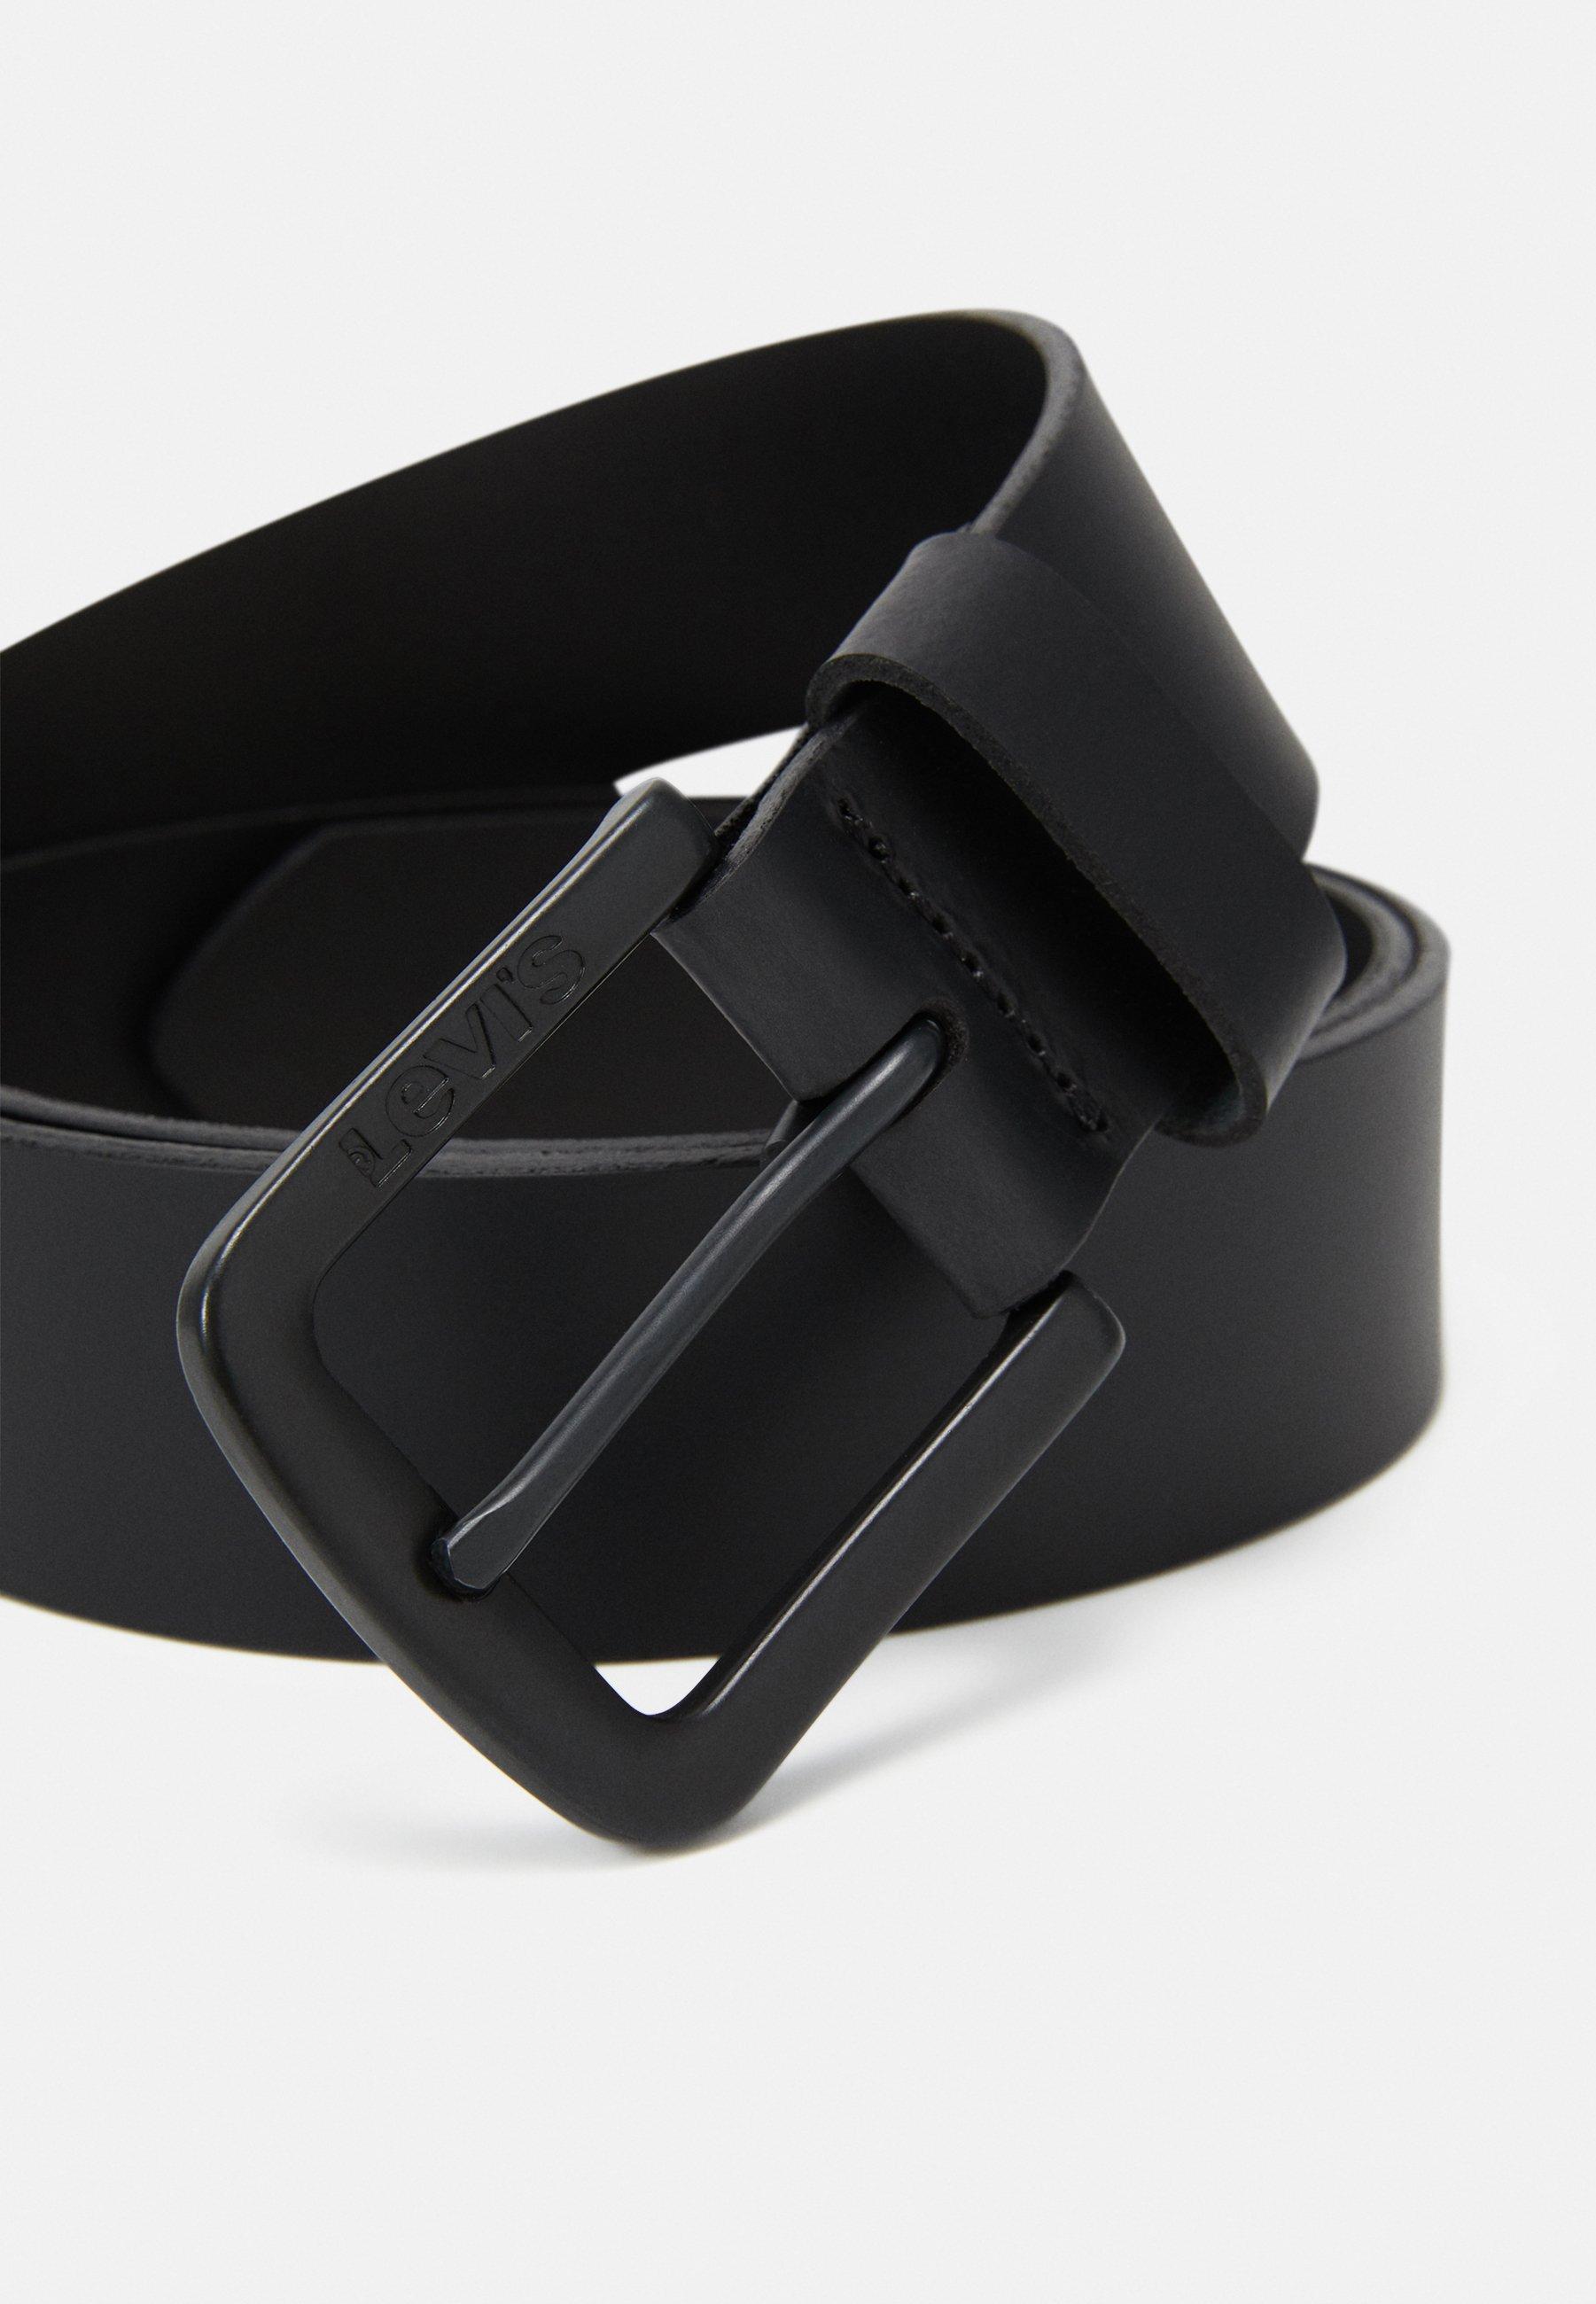 Levi's® Belte - regular black/svart L0TIICh0fxLYWoW